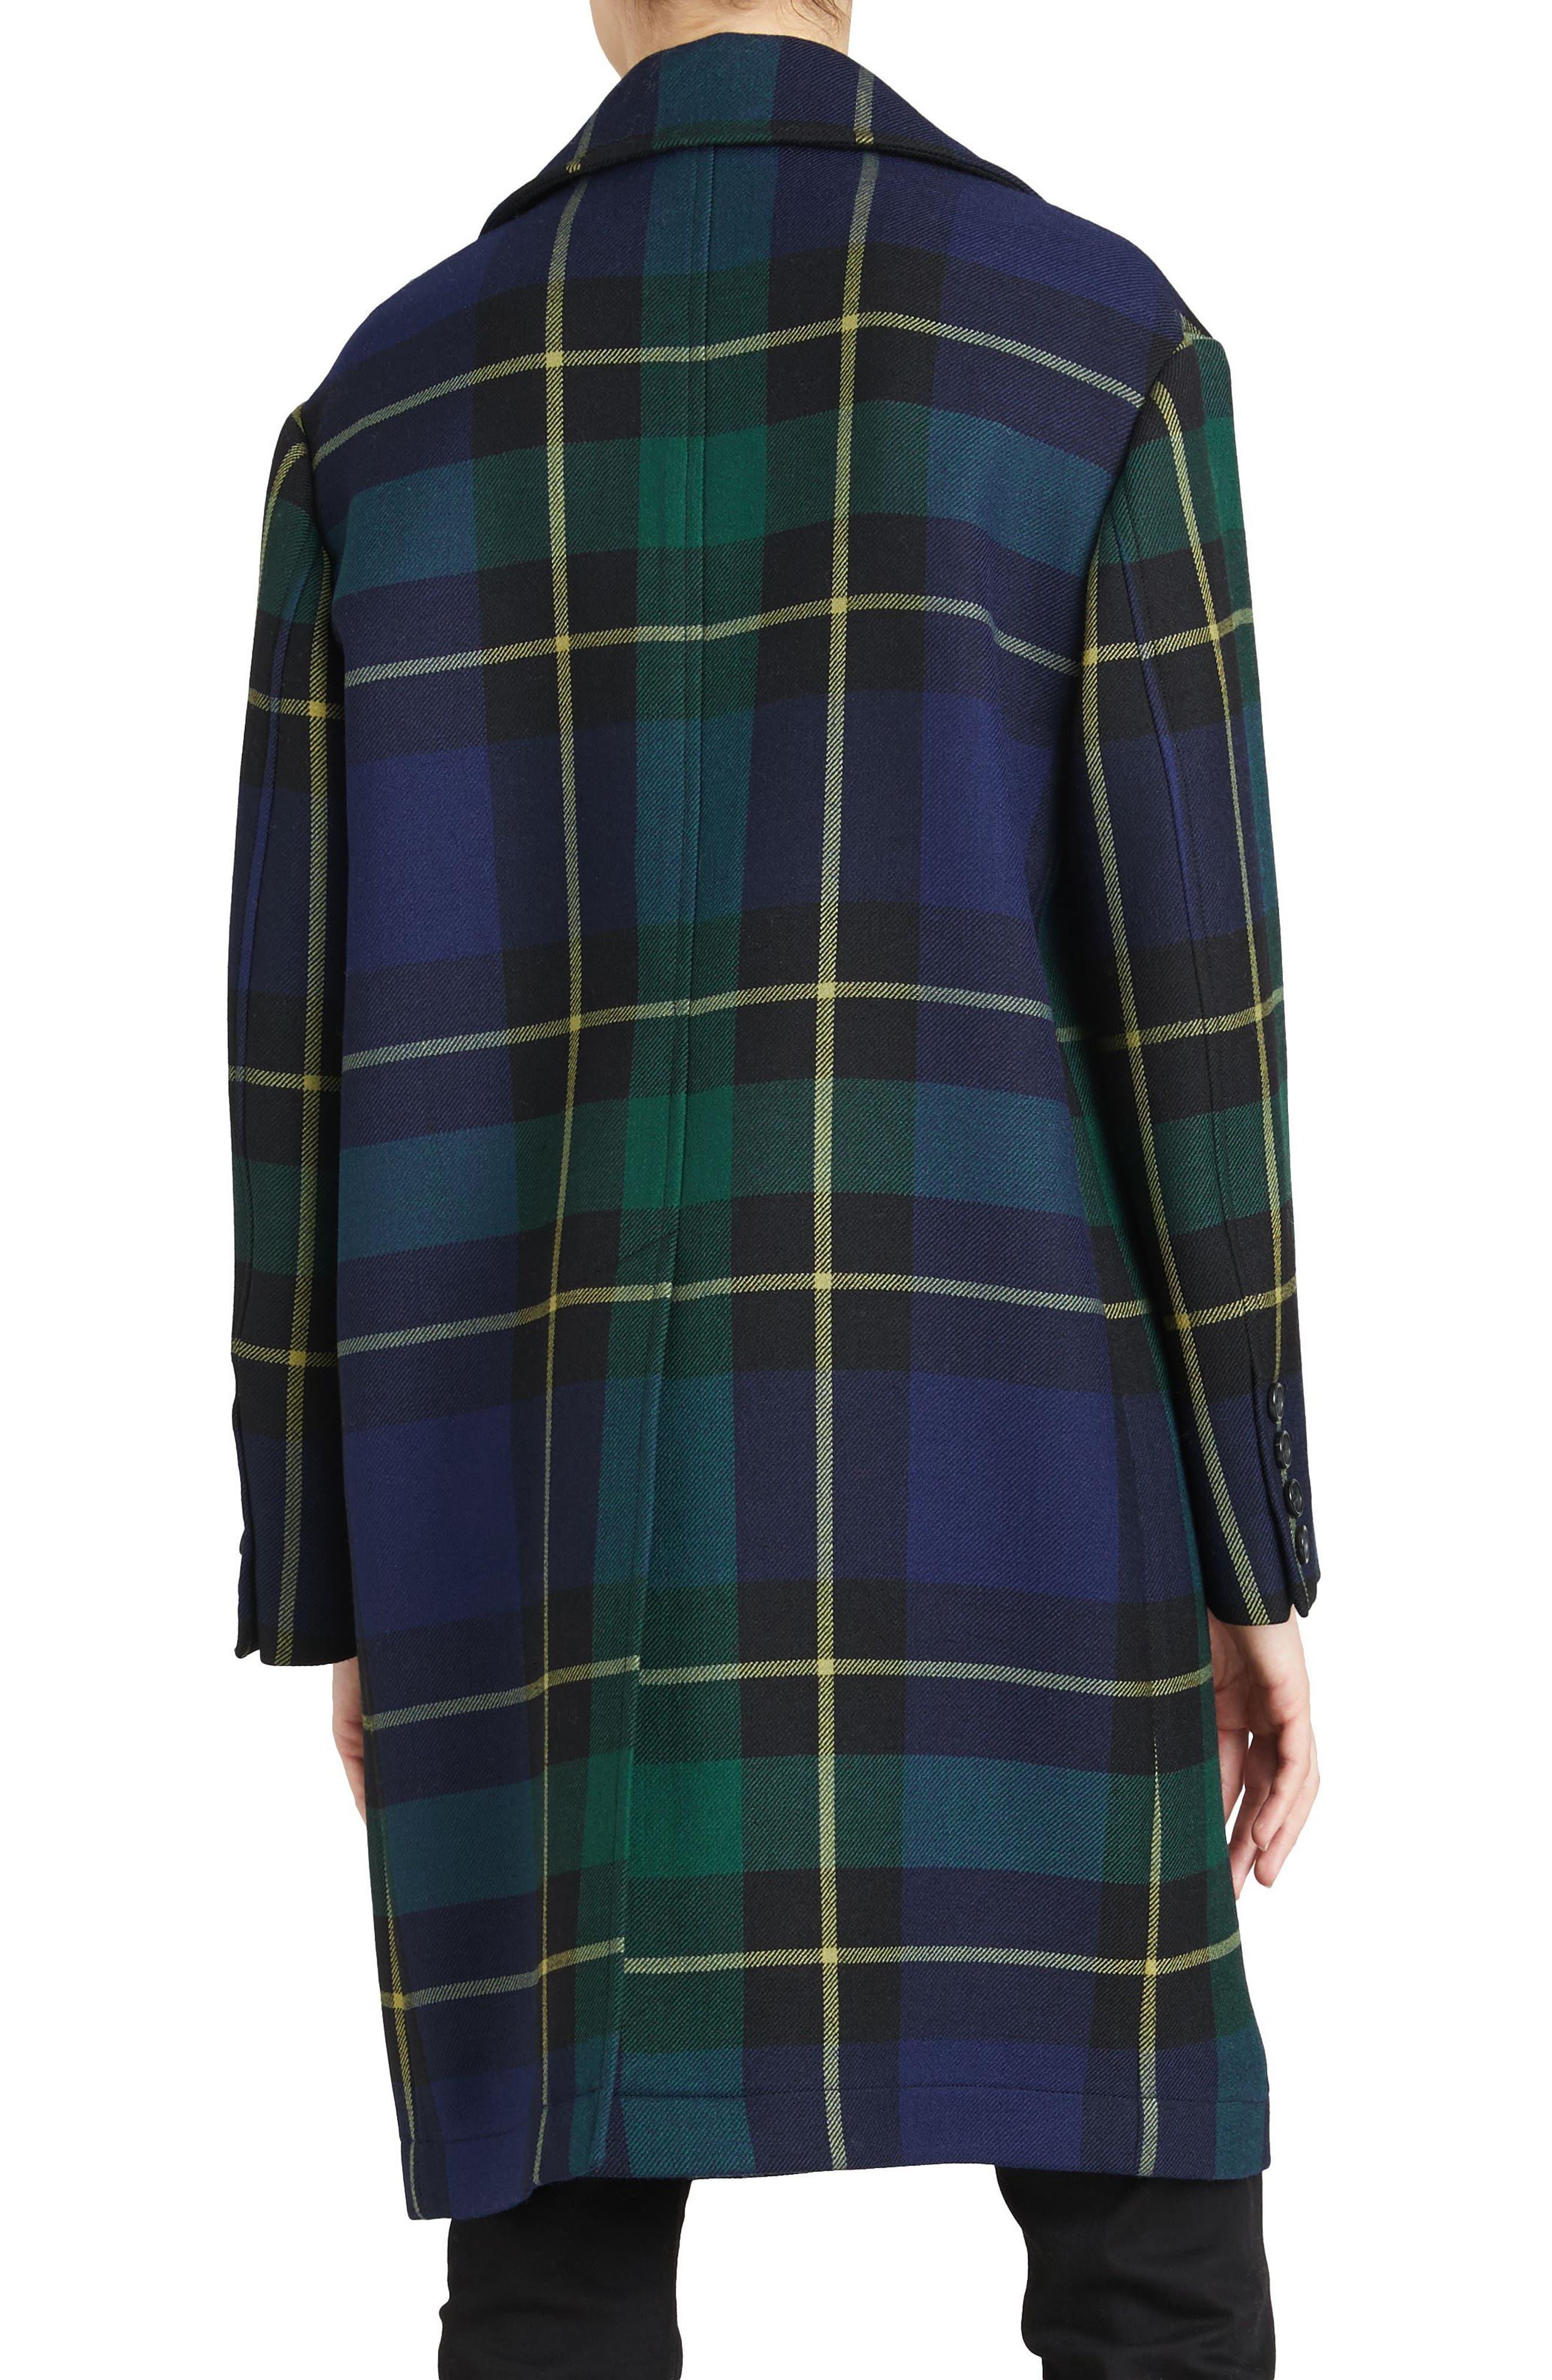 Strathyre Tartan Plaid Wool Blend Coat,                             Alternate thumbnail 2, color,                             303